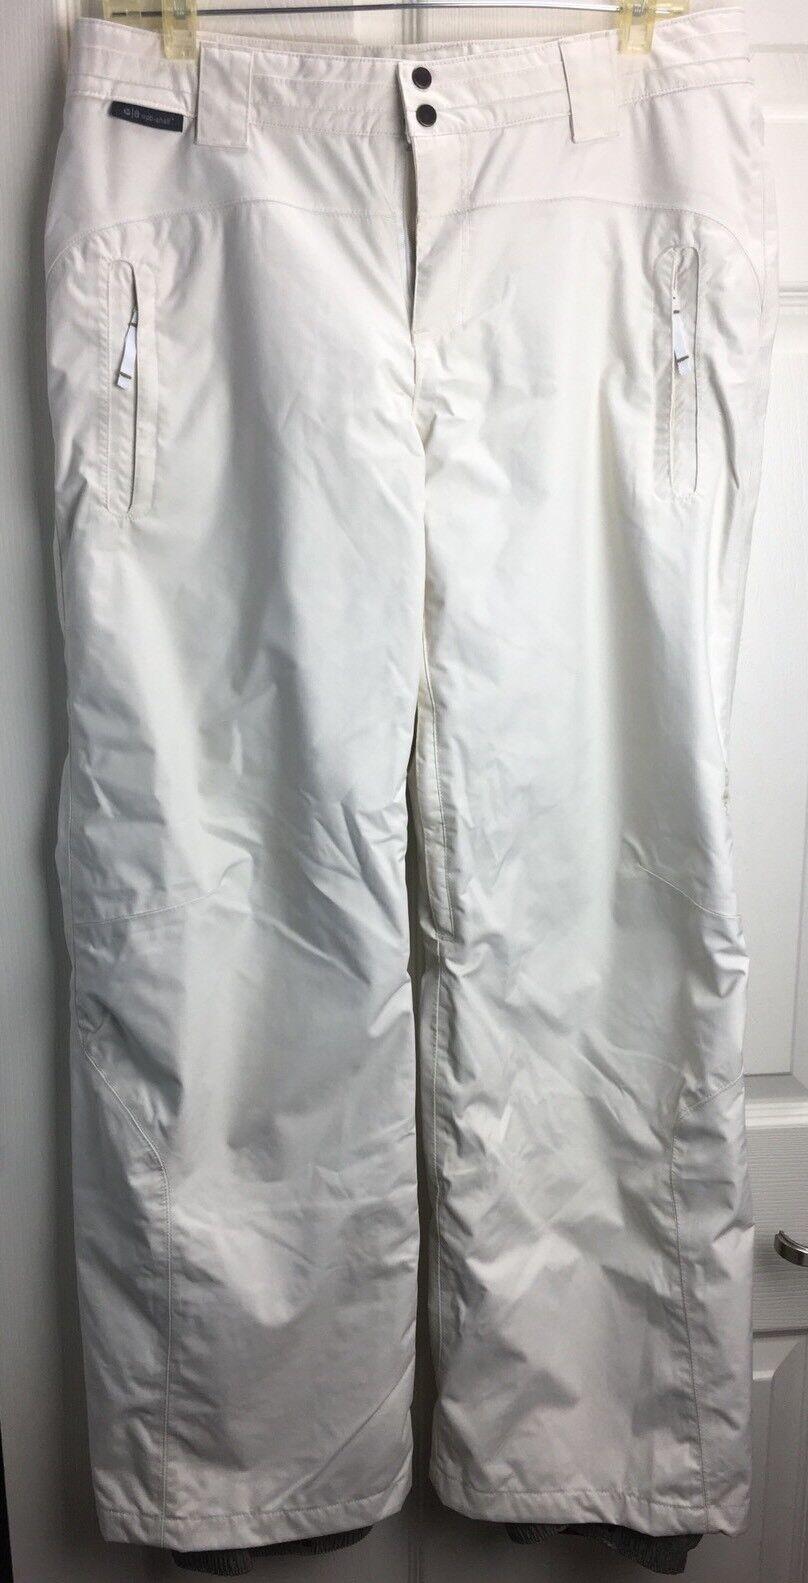 NWOT Merrill Sz M Ivory Opti-Shell WATERPROOF Vented Ski Snow Snowboard Pants